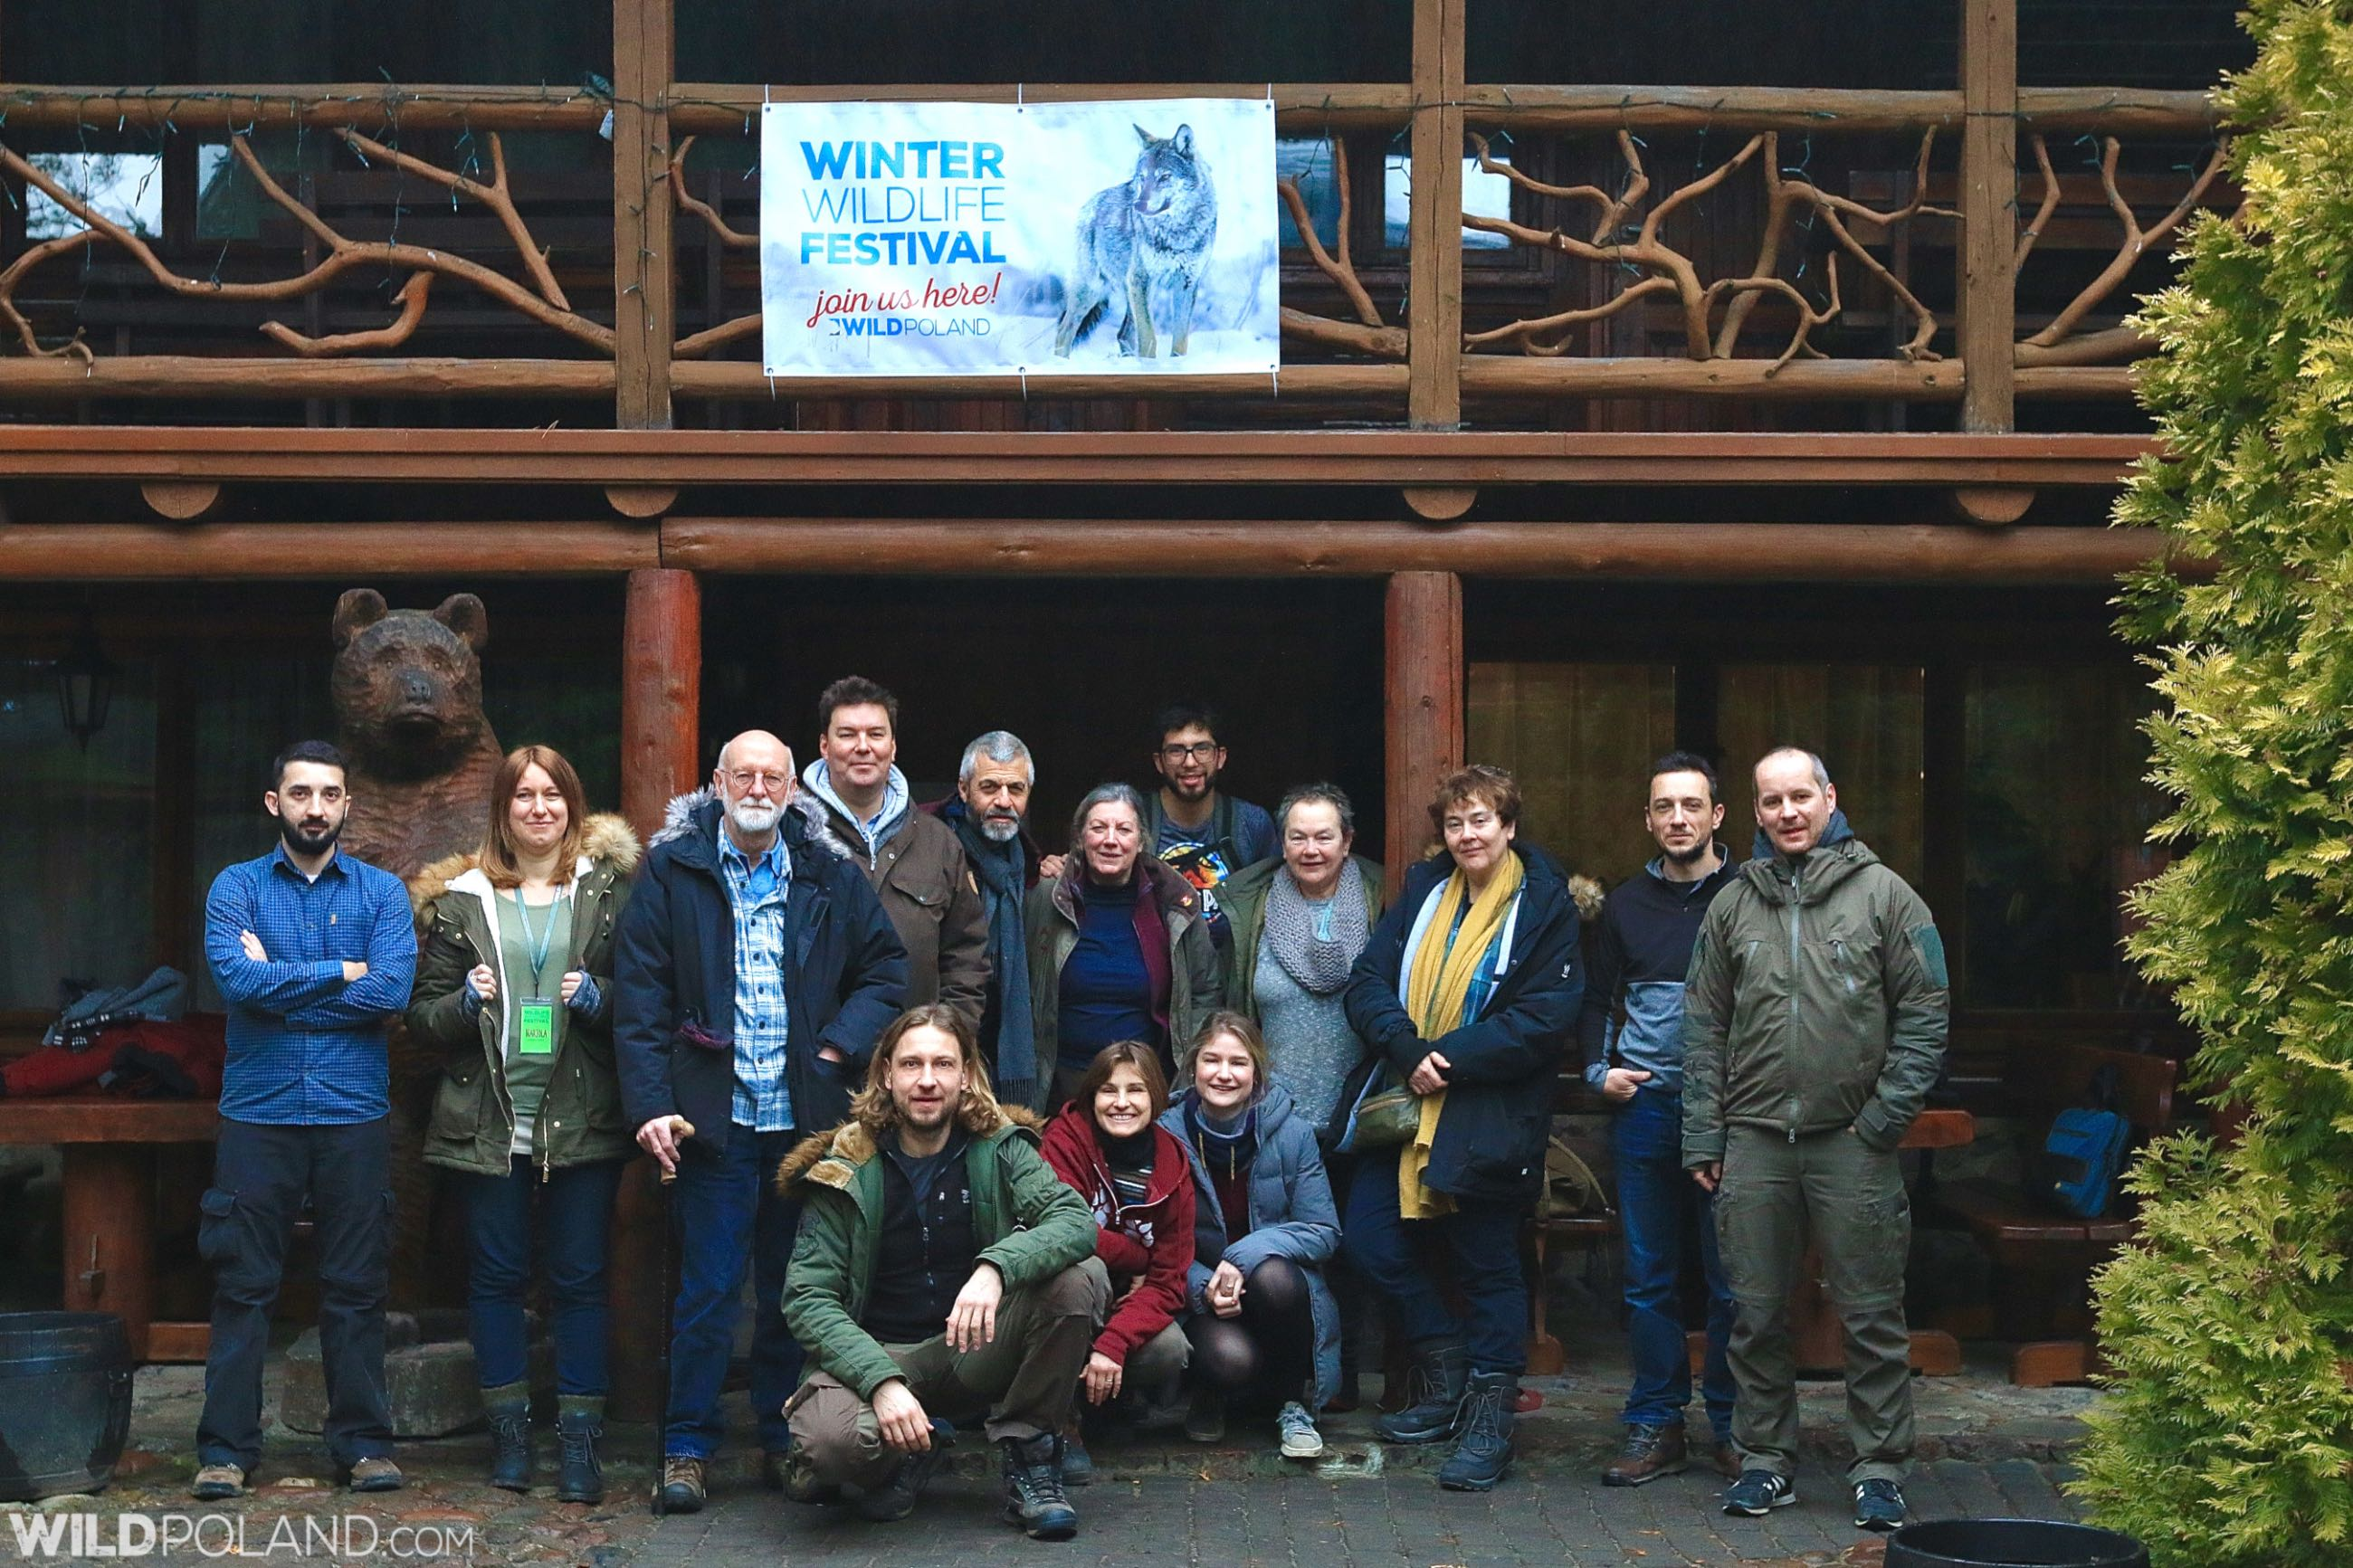 Wild Poland Winter Wildlife Festival 2020 group.